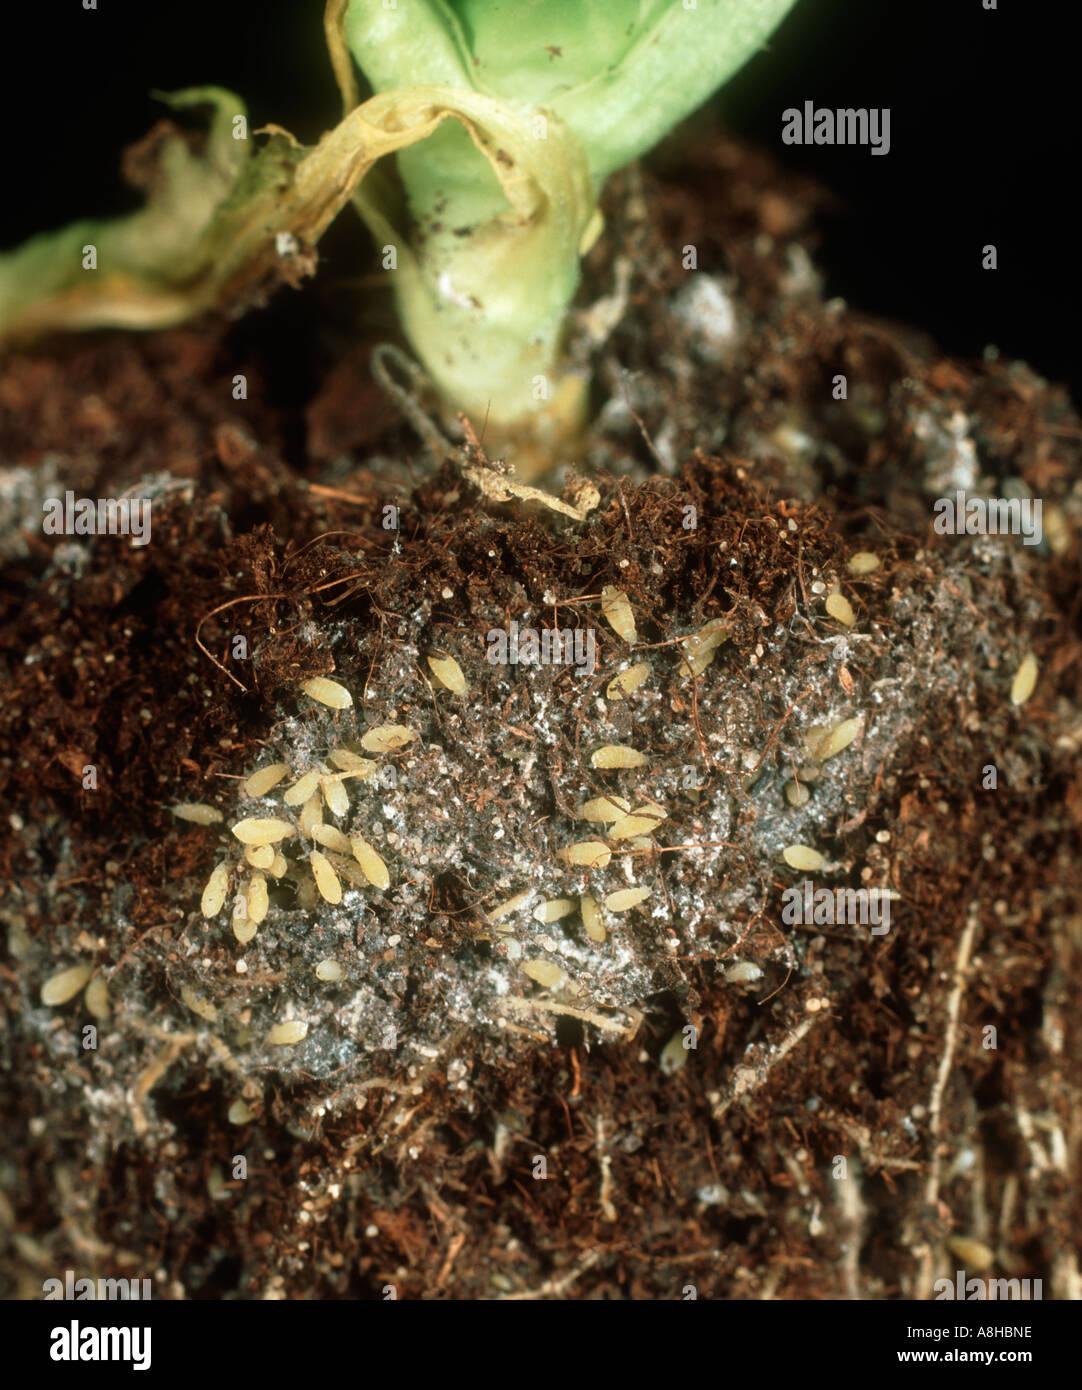 Lettuce root aphid Pemphigus bursarius colony on lettuce roots - Stock Image